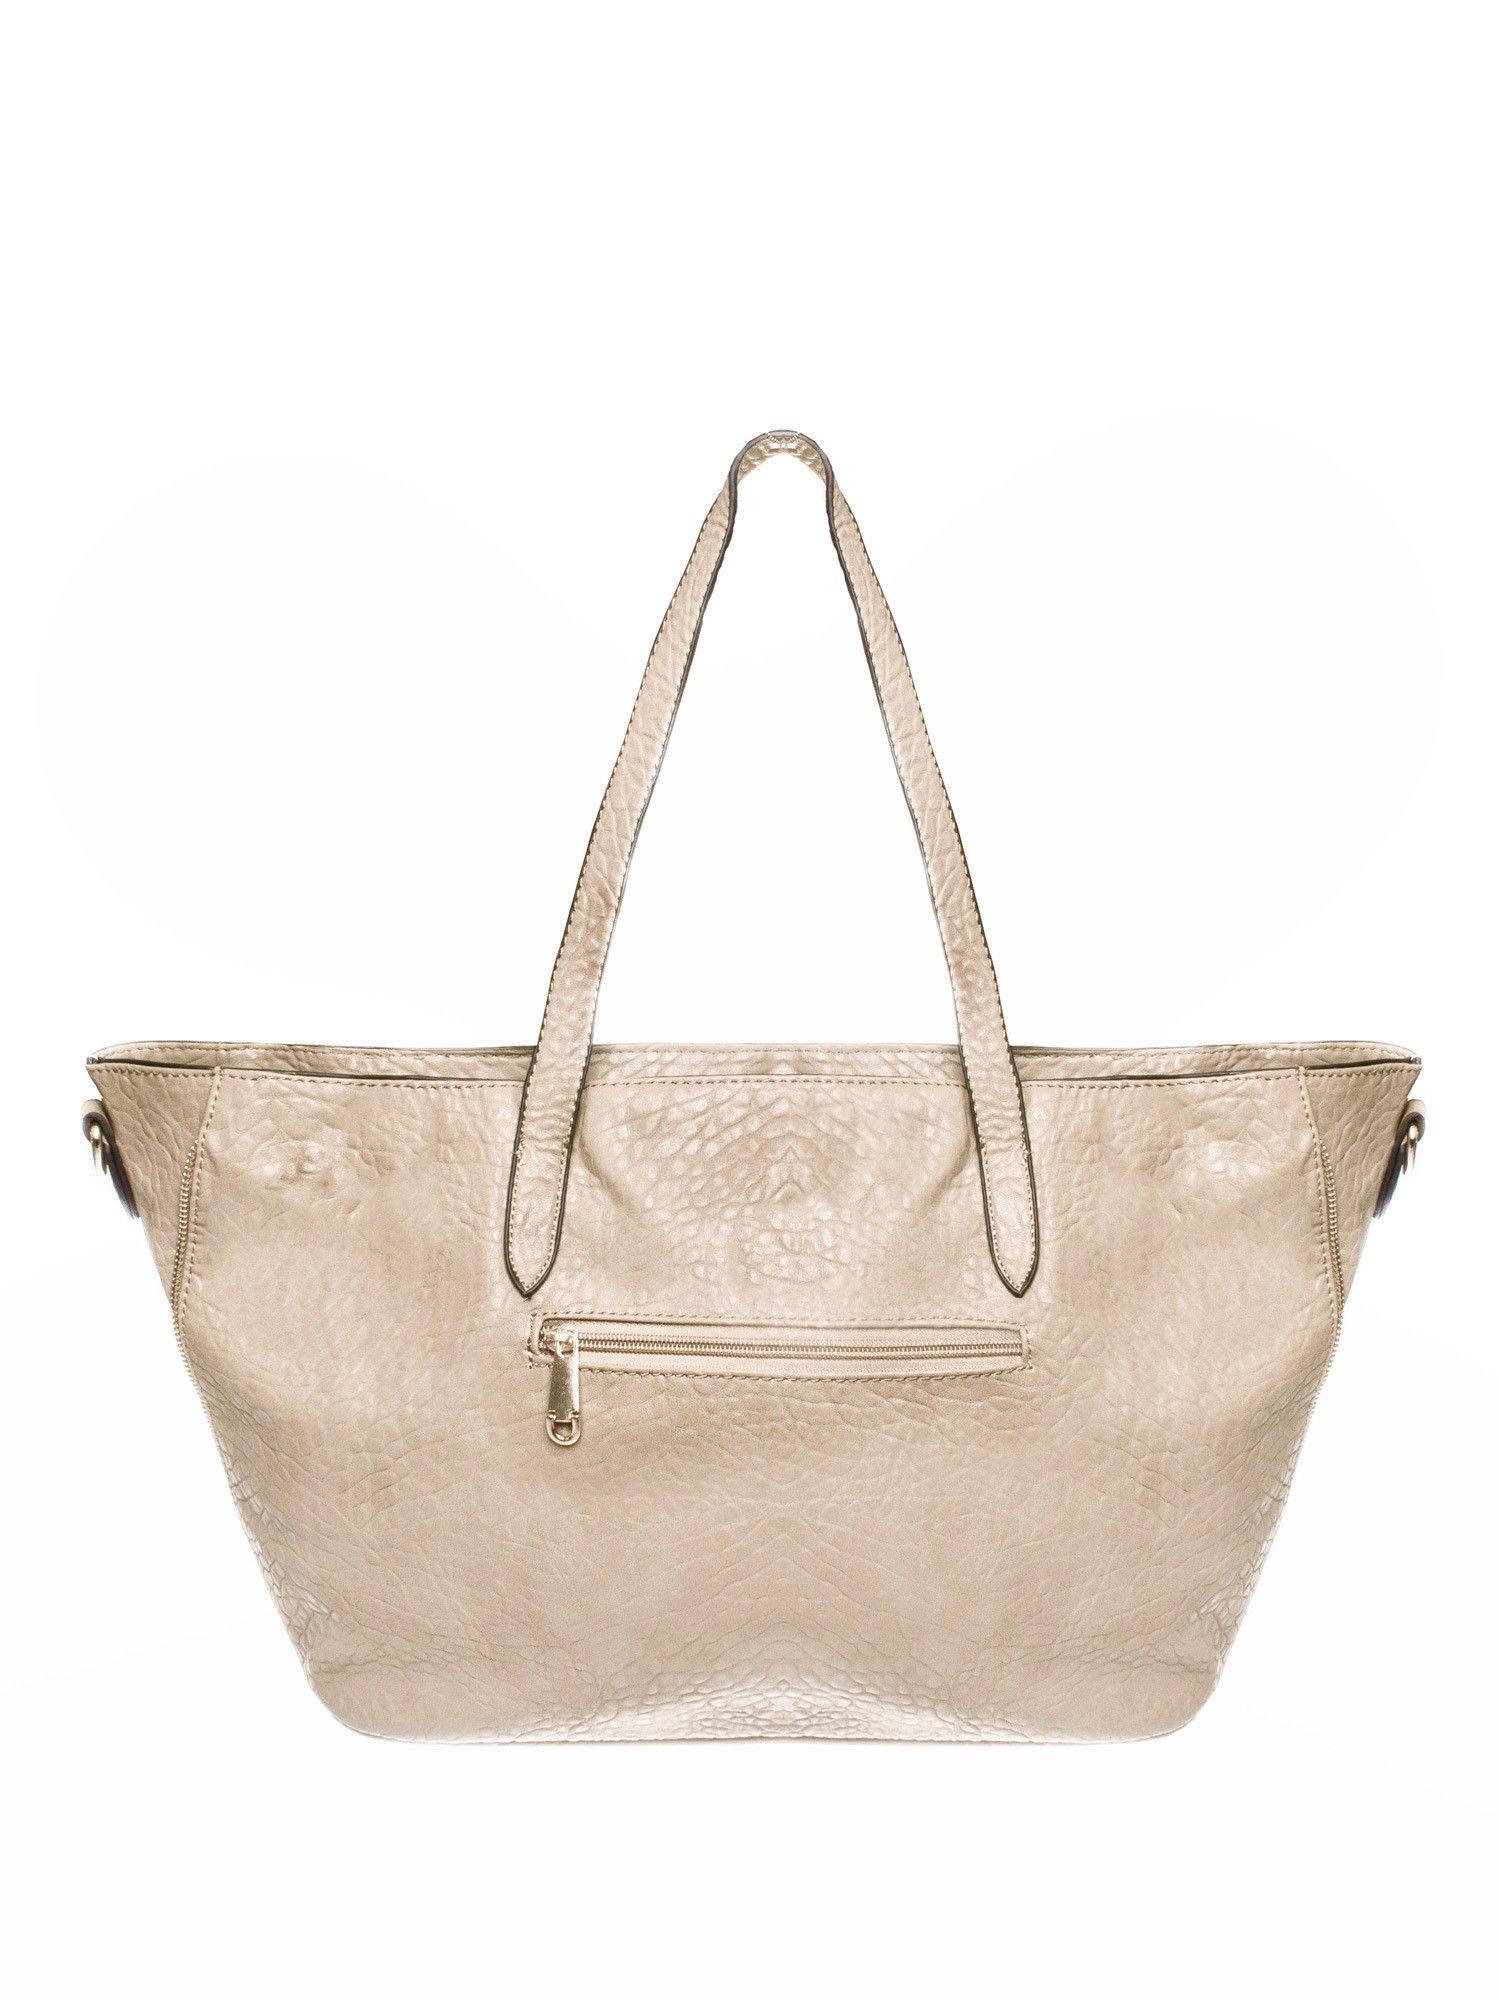 Beżowa torebka shopper bag z apaszką                                  zdj.                                  2